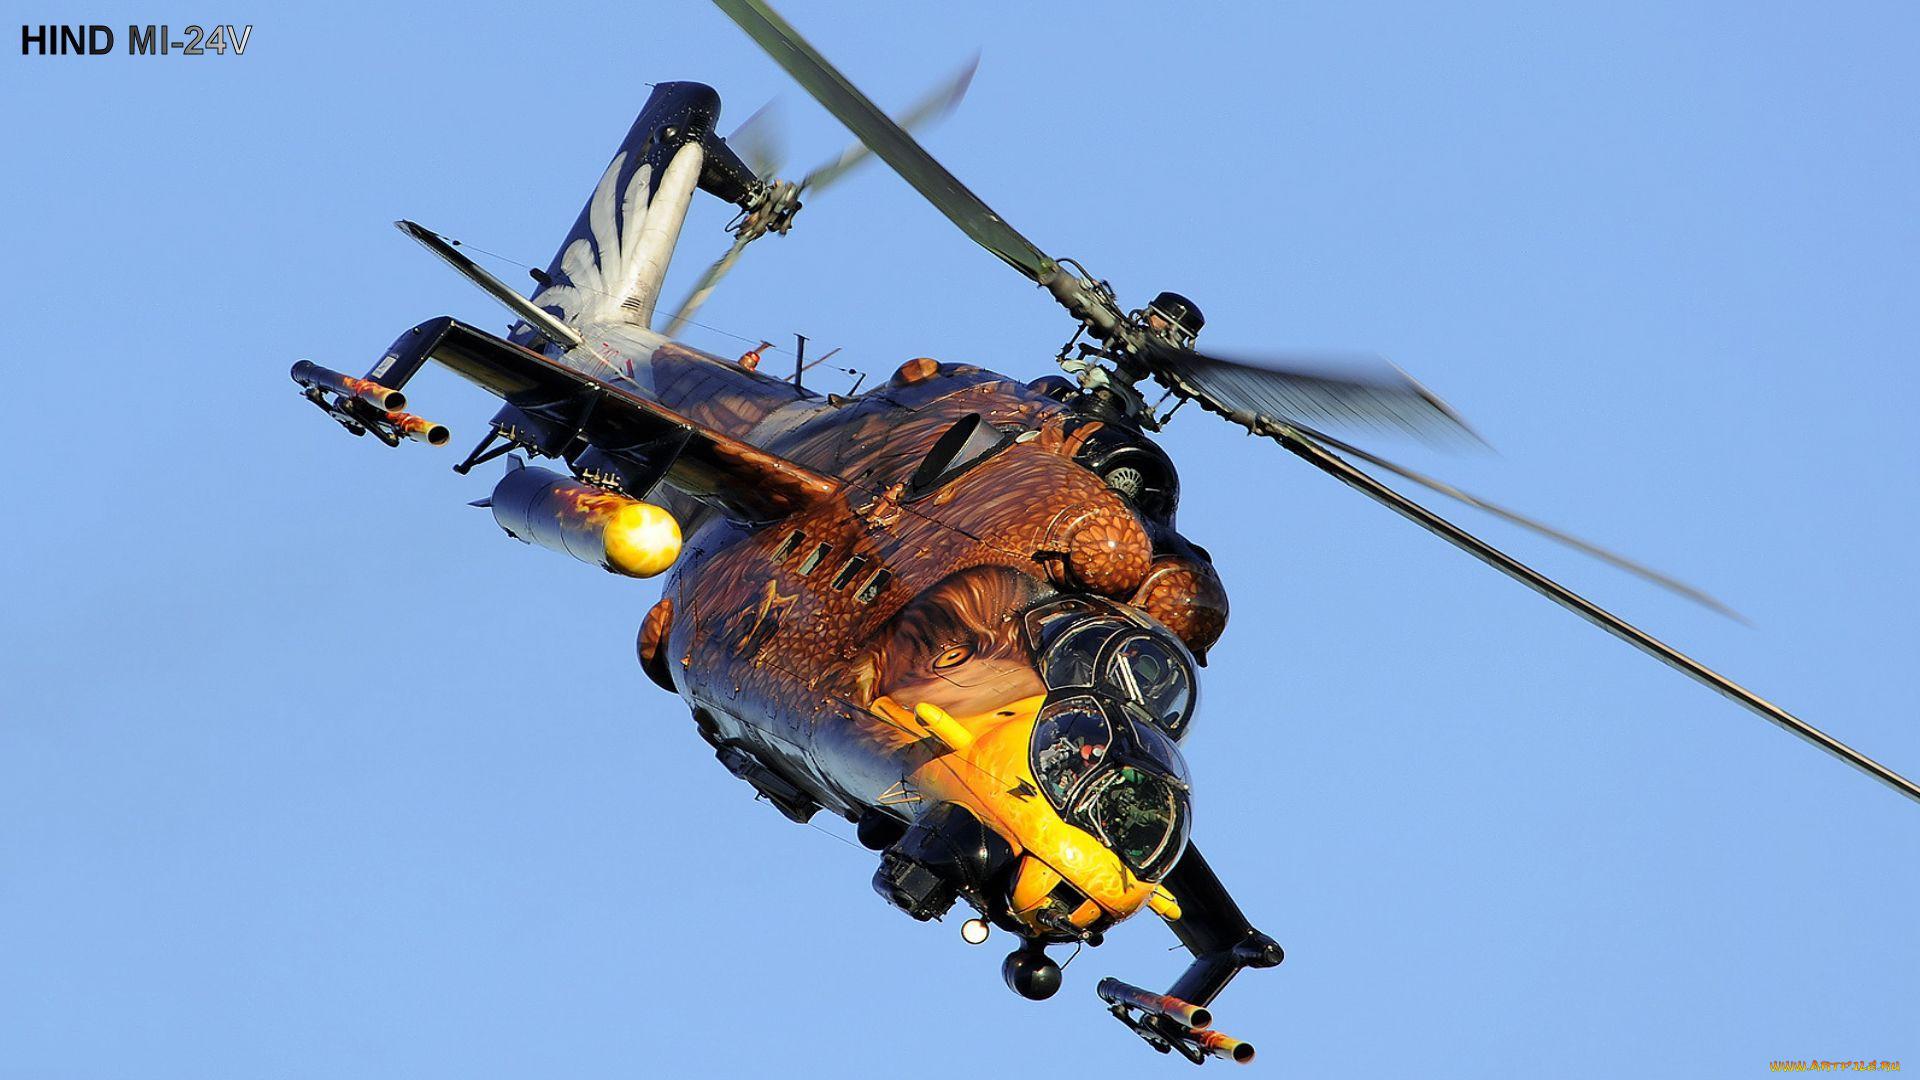 Mil mi 24 авиация вертолёты раскраска